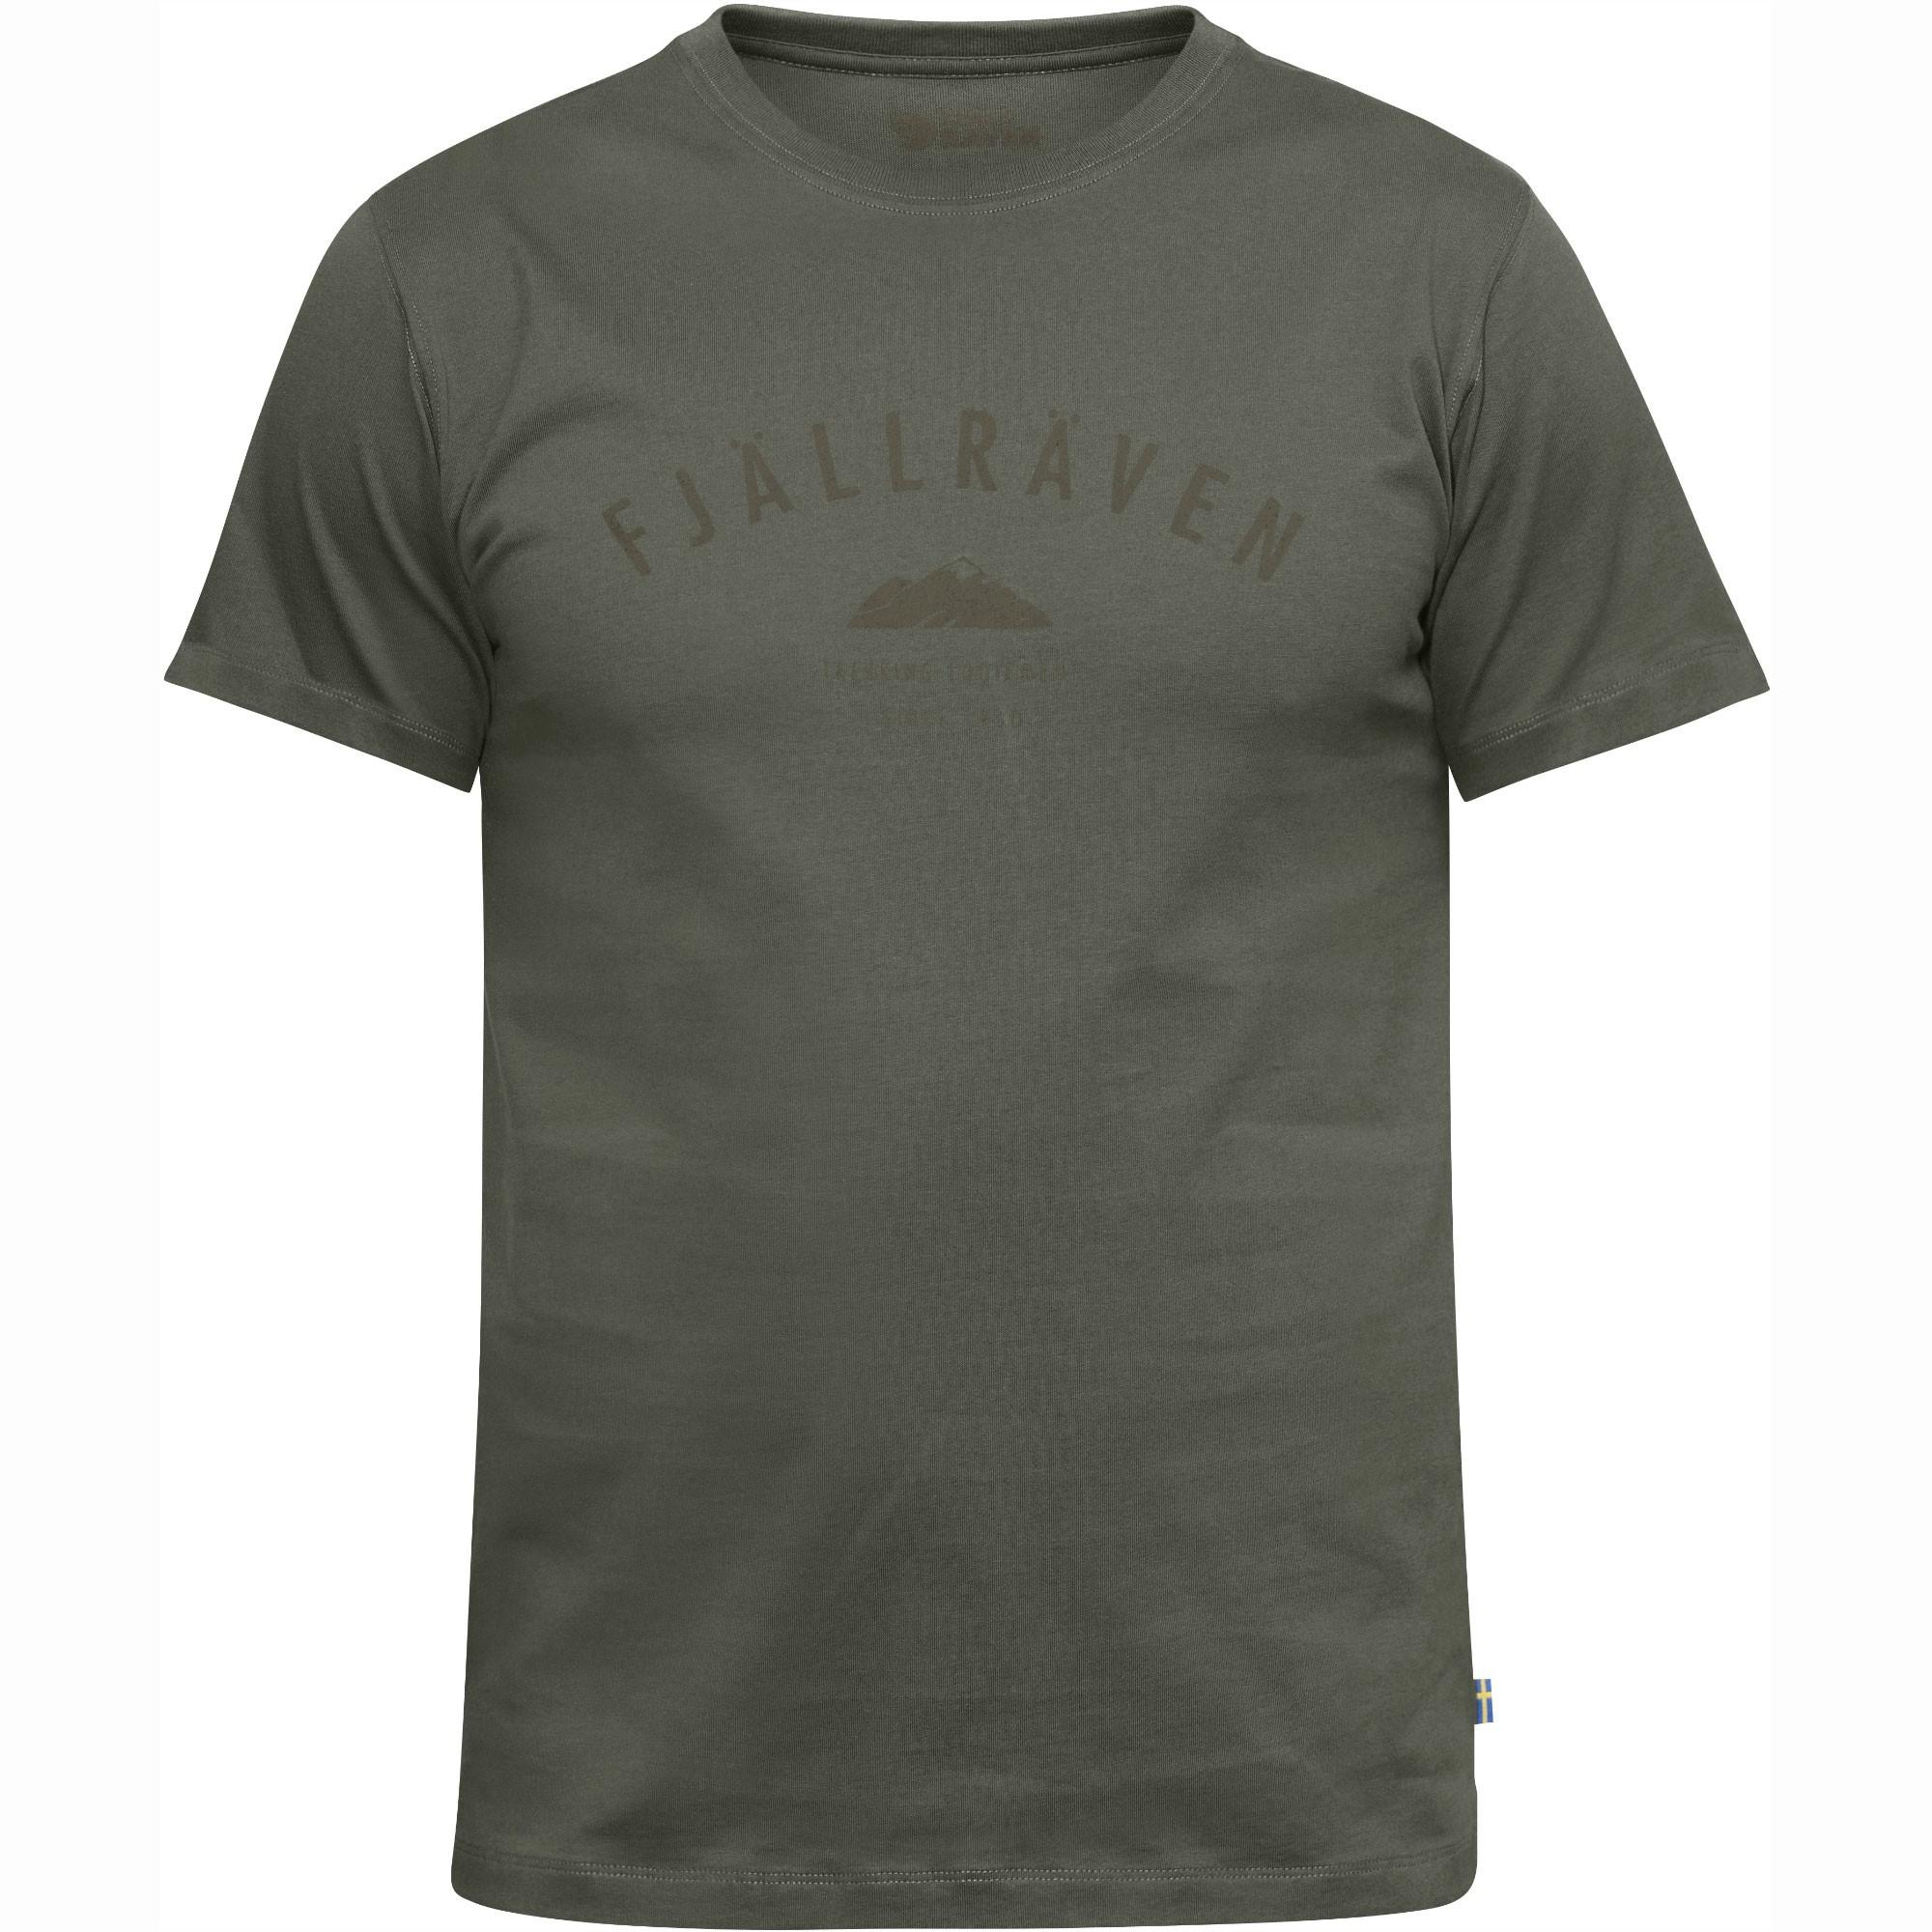 Fjallraven Trekking Equipment T-Shirt 81955 - Mountain Grey